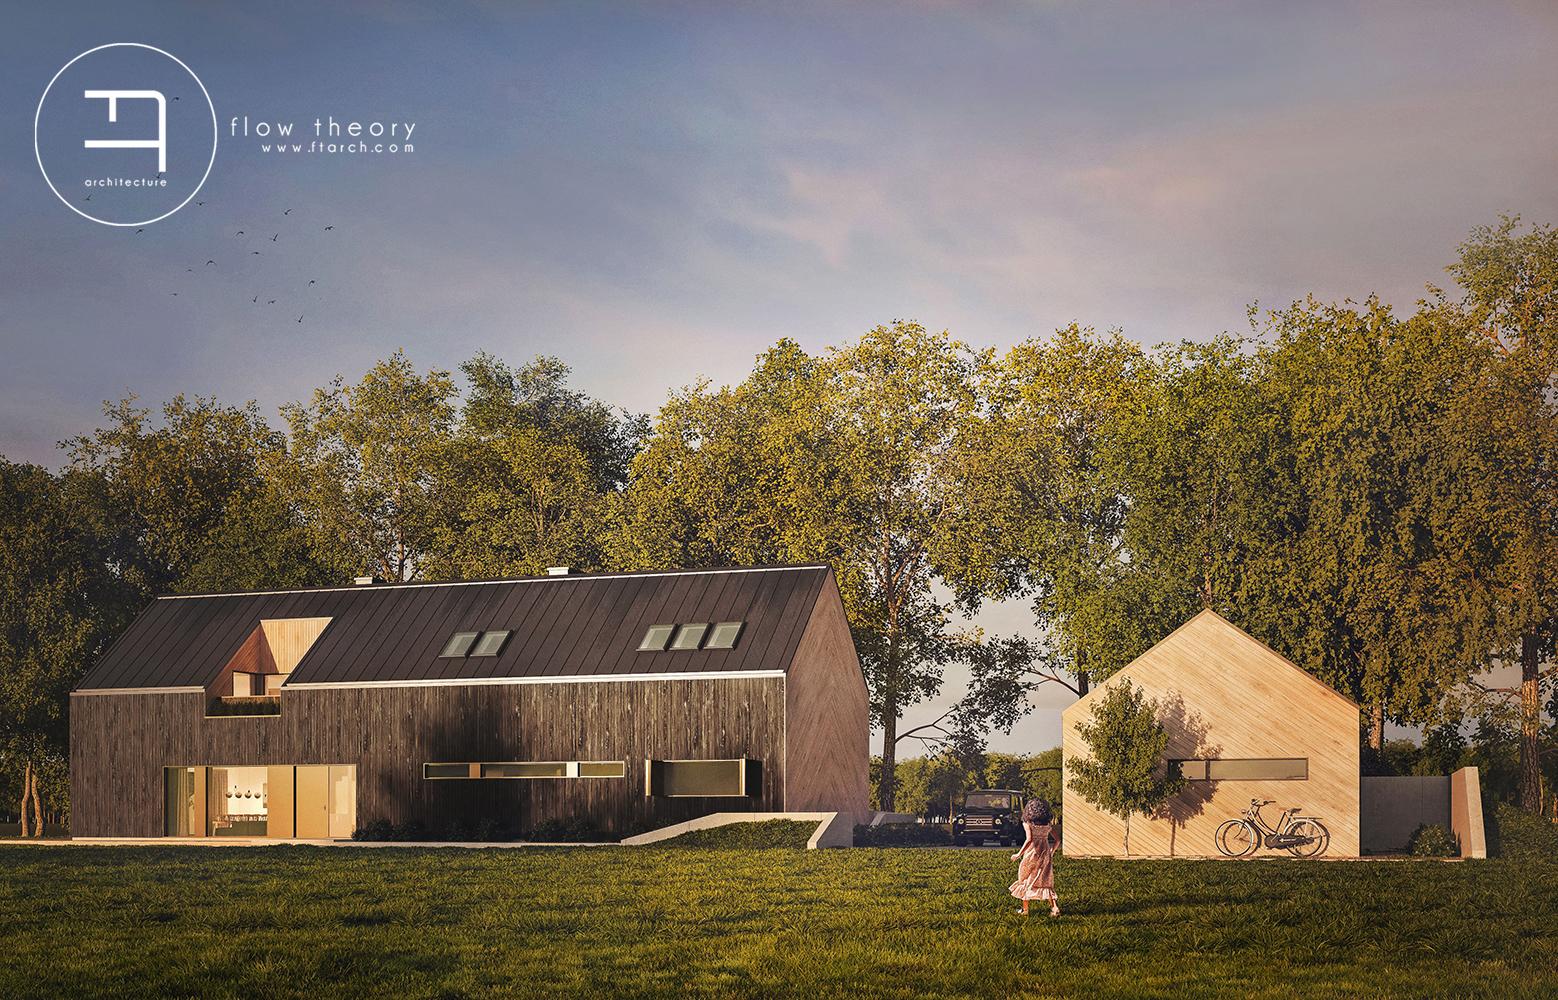 FT architecture ekologiczny budynek